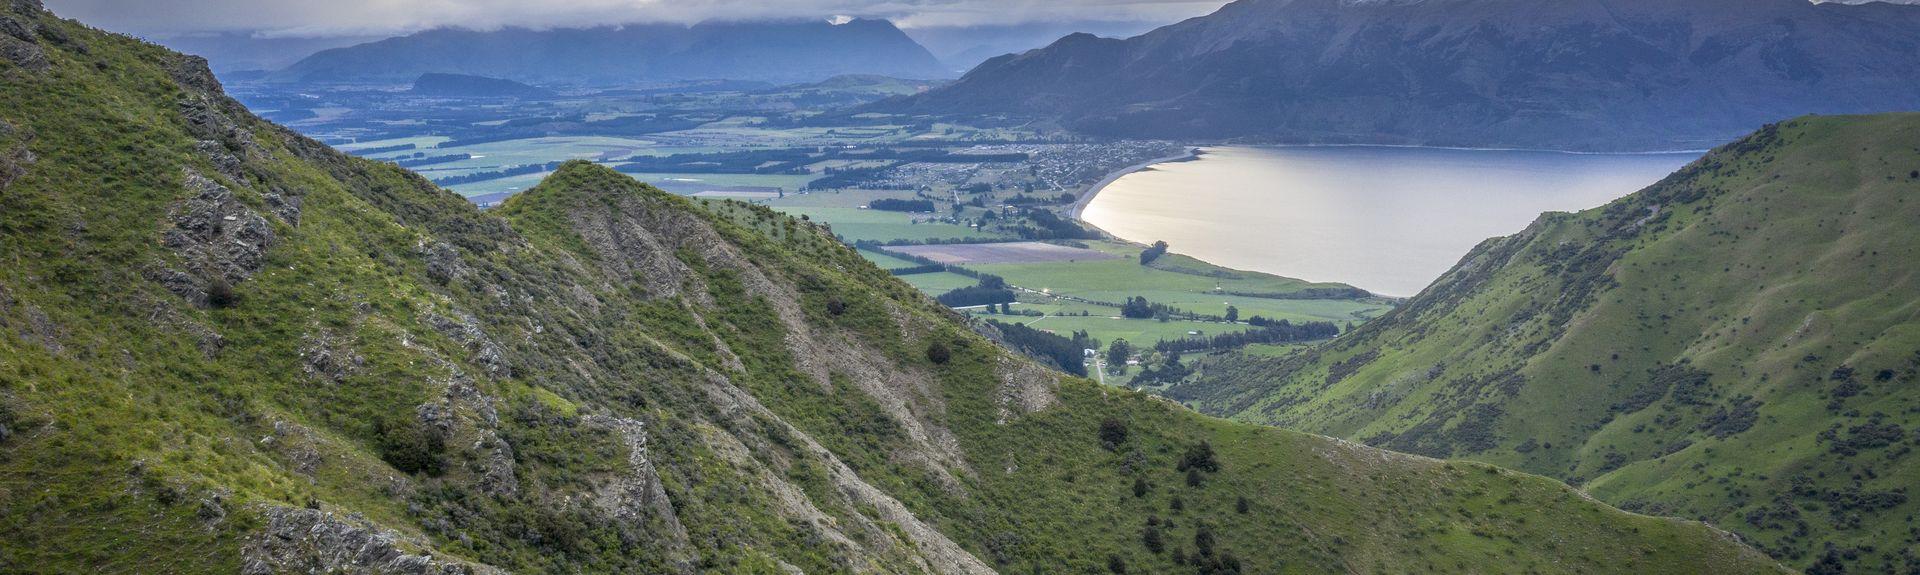 Dingle Burn, Queenstown Lakes, Otago, New Zealand